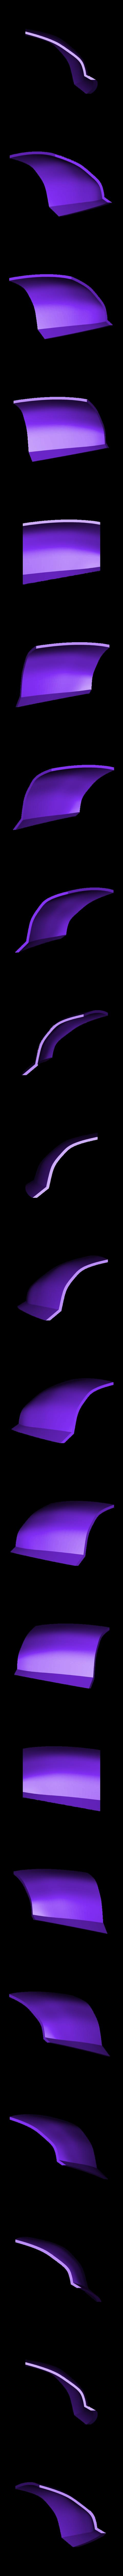 Part 14 v1.stl Download STL file ARF Trooper Helmet • 3D print object, VillainousPropShop